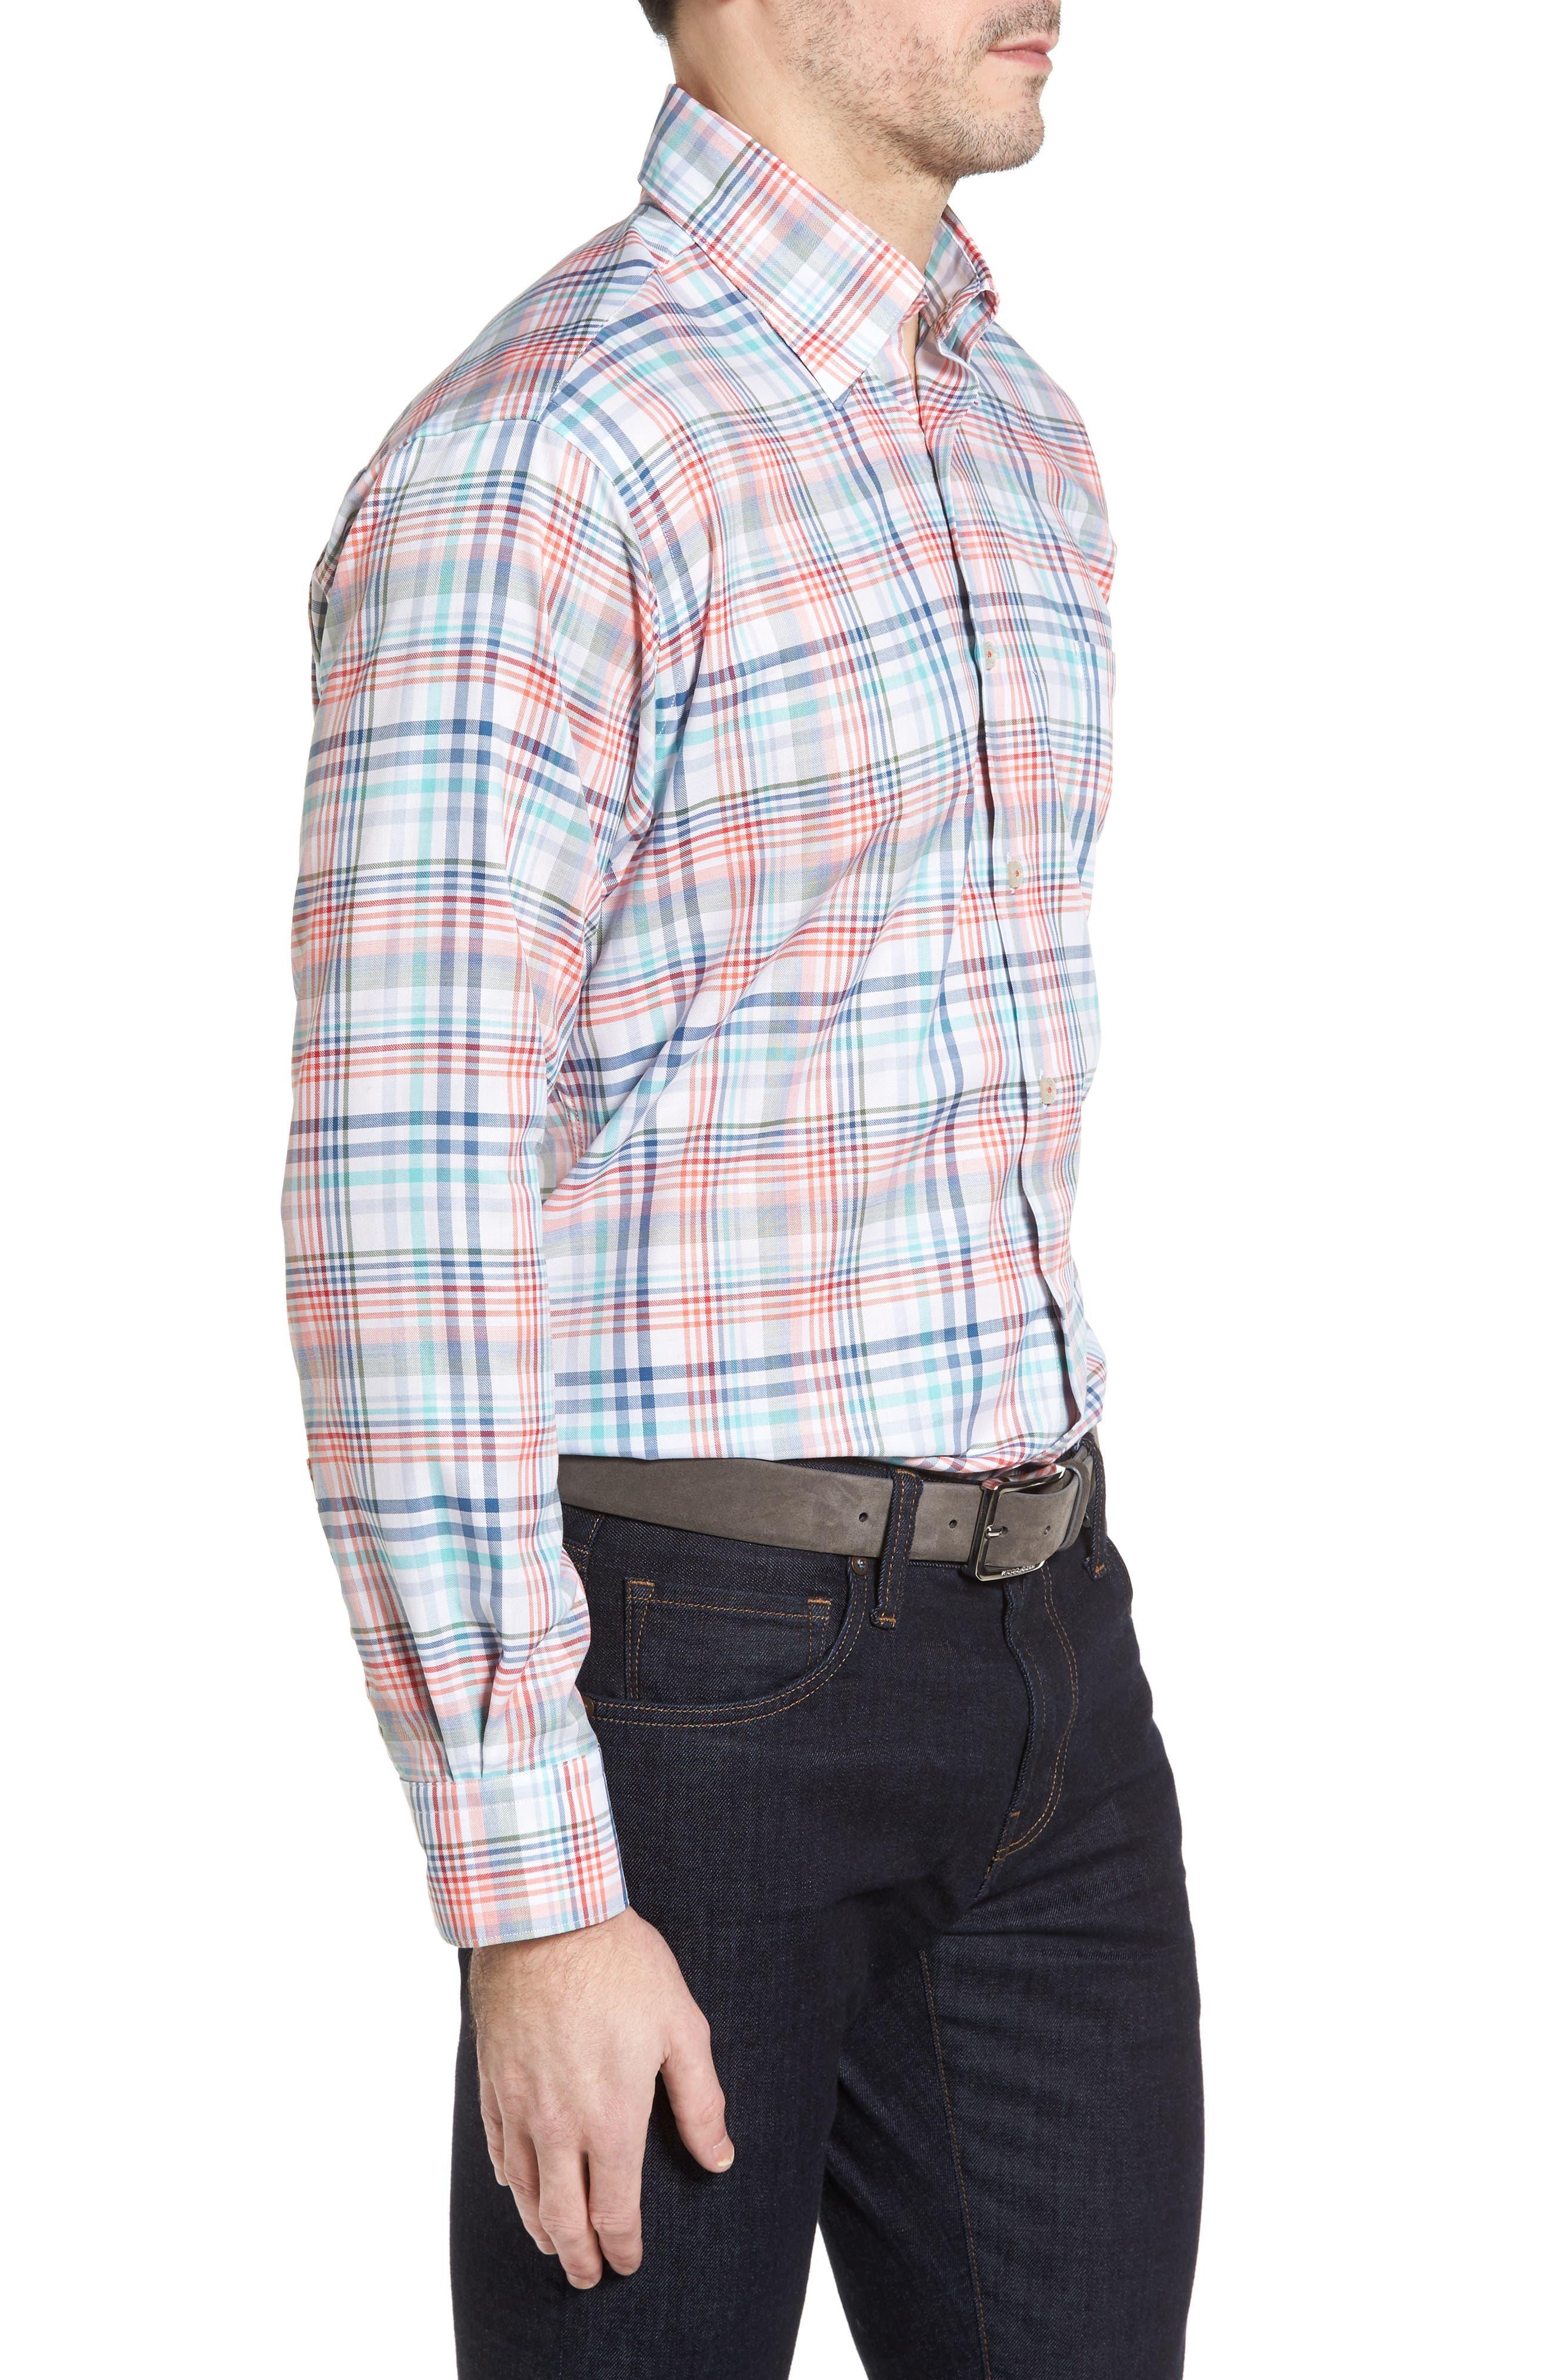 ROBERT TALBOTT,                             Anderson Classic Fit Plaid Twill Sport Shirt,                             Alternate thumbnail 3, color,                             860